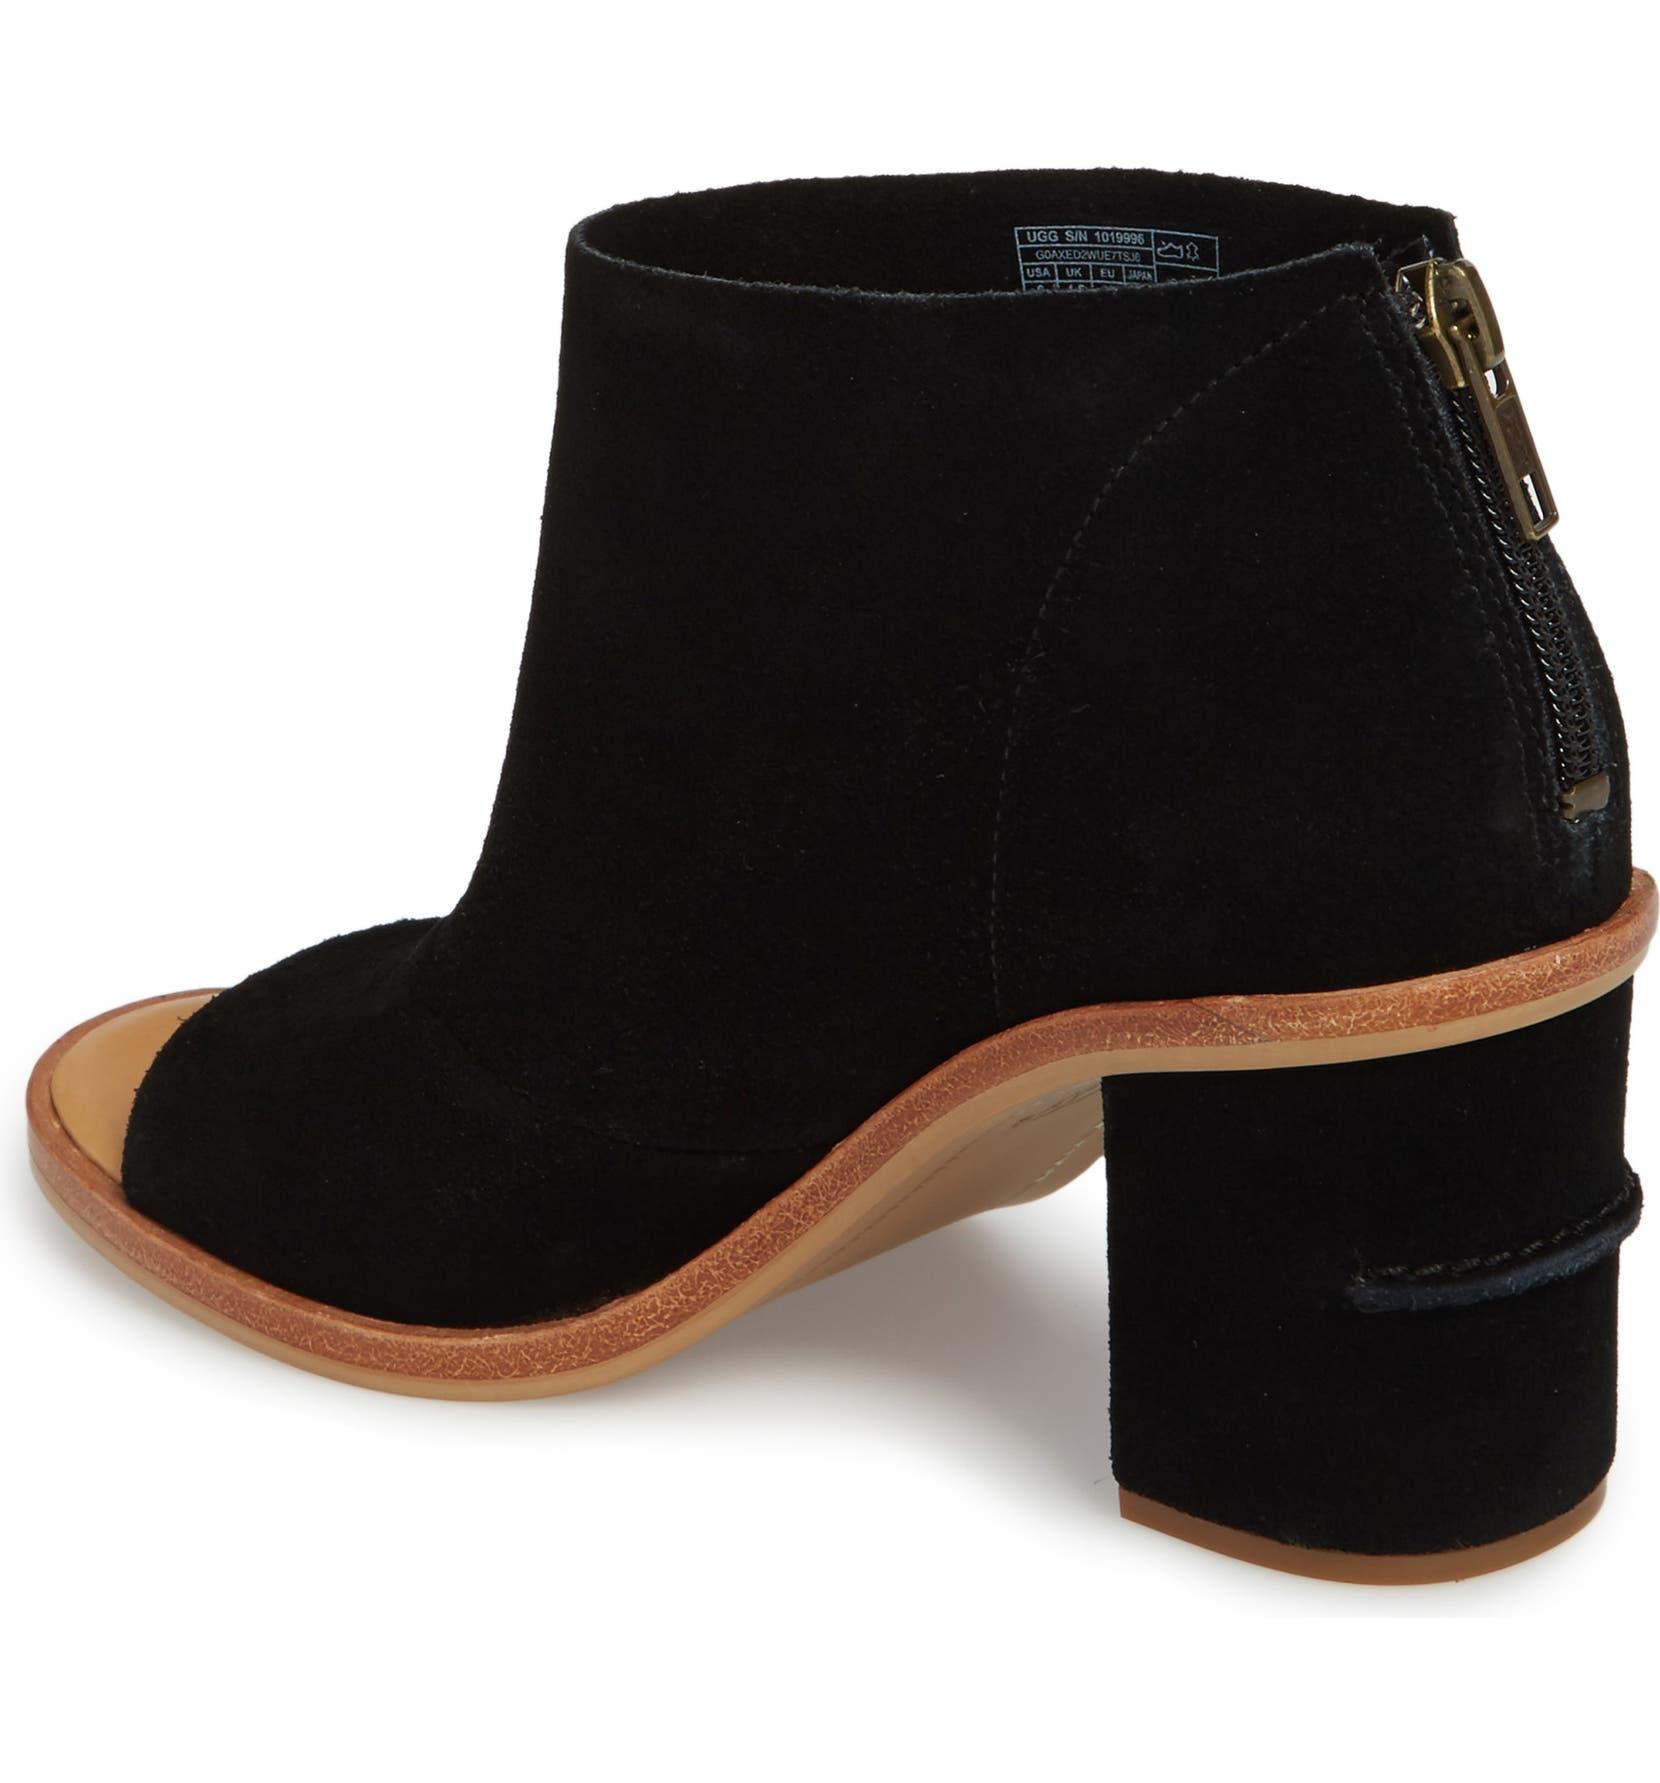 9e231dd0aa5 UGG® Ginger Peep Toe Bootie (Women)   Nordstrom